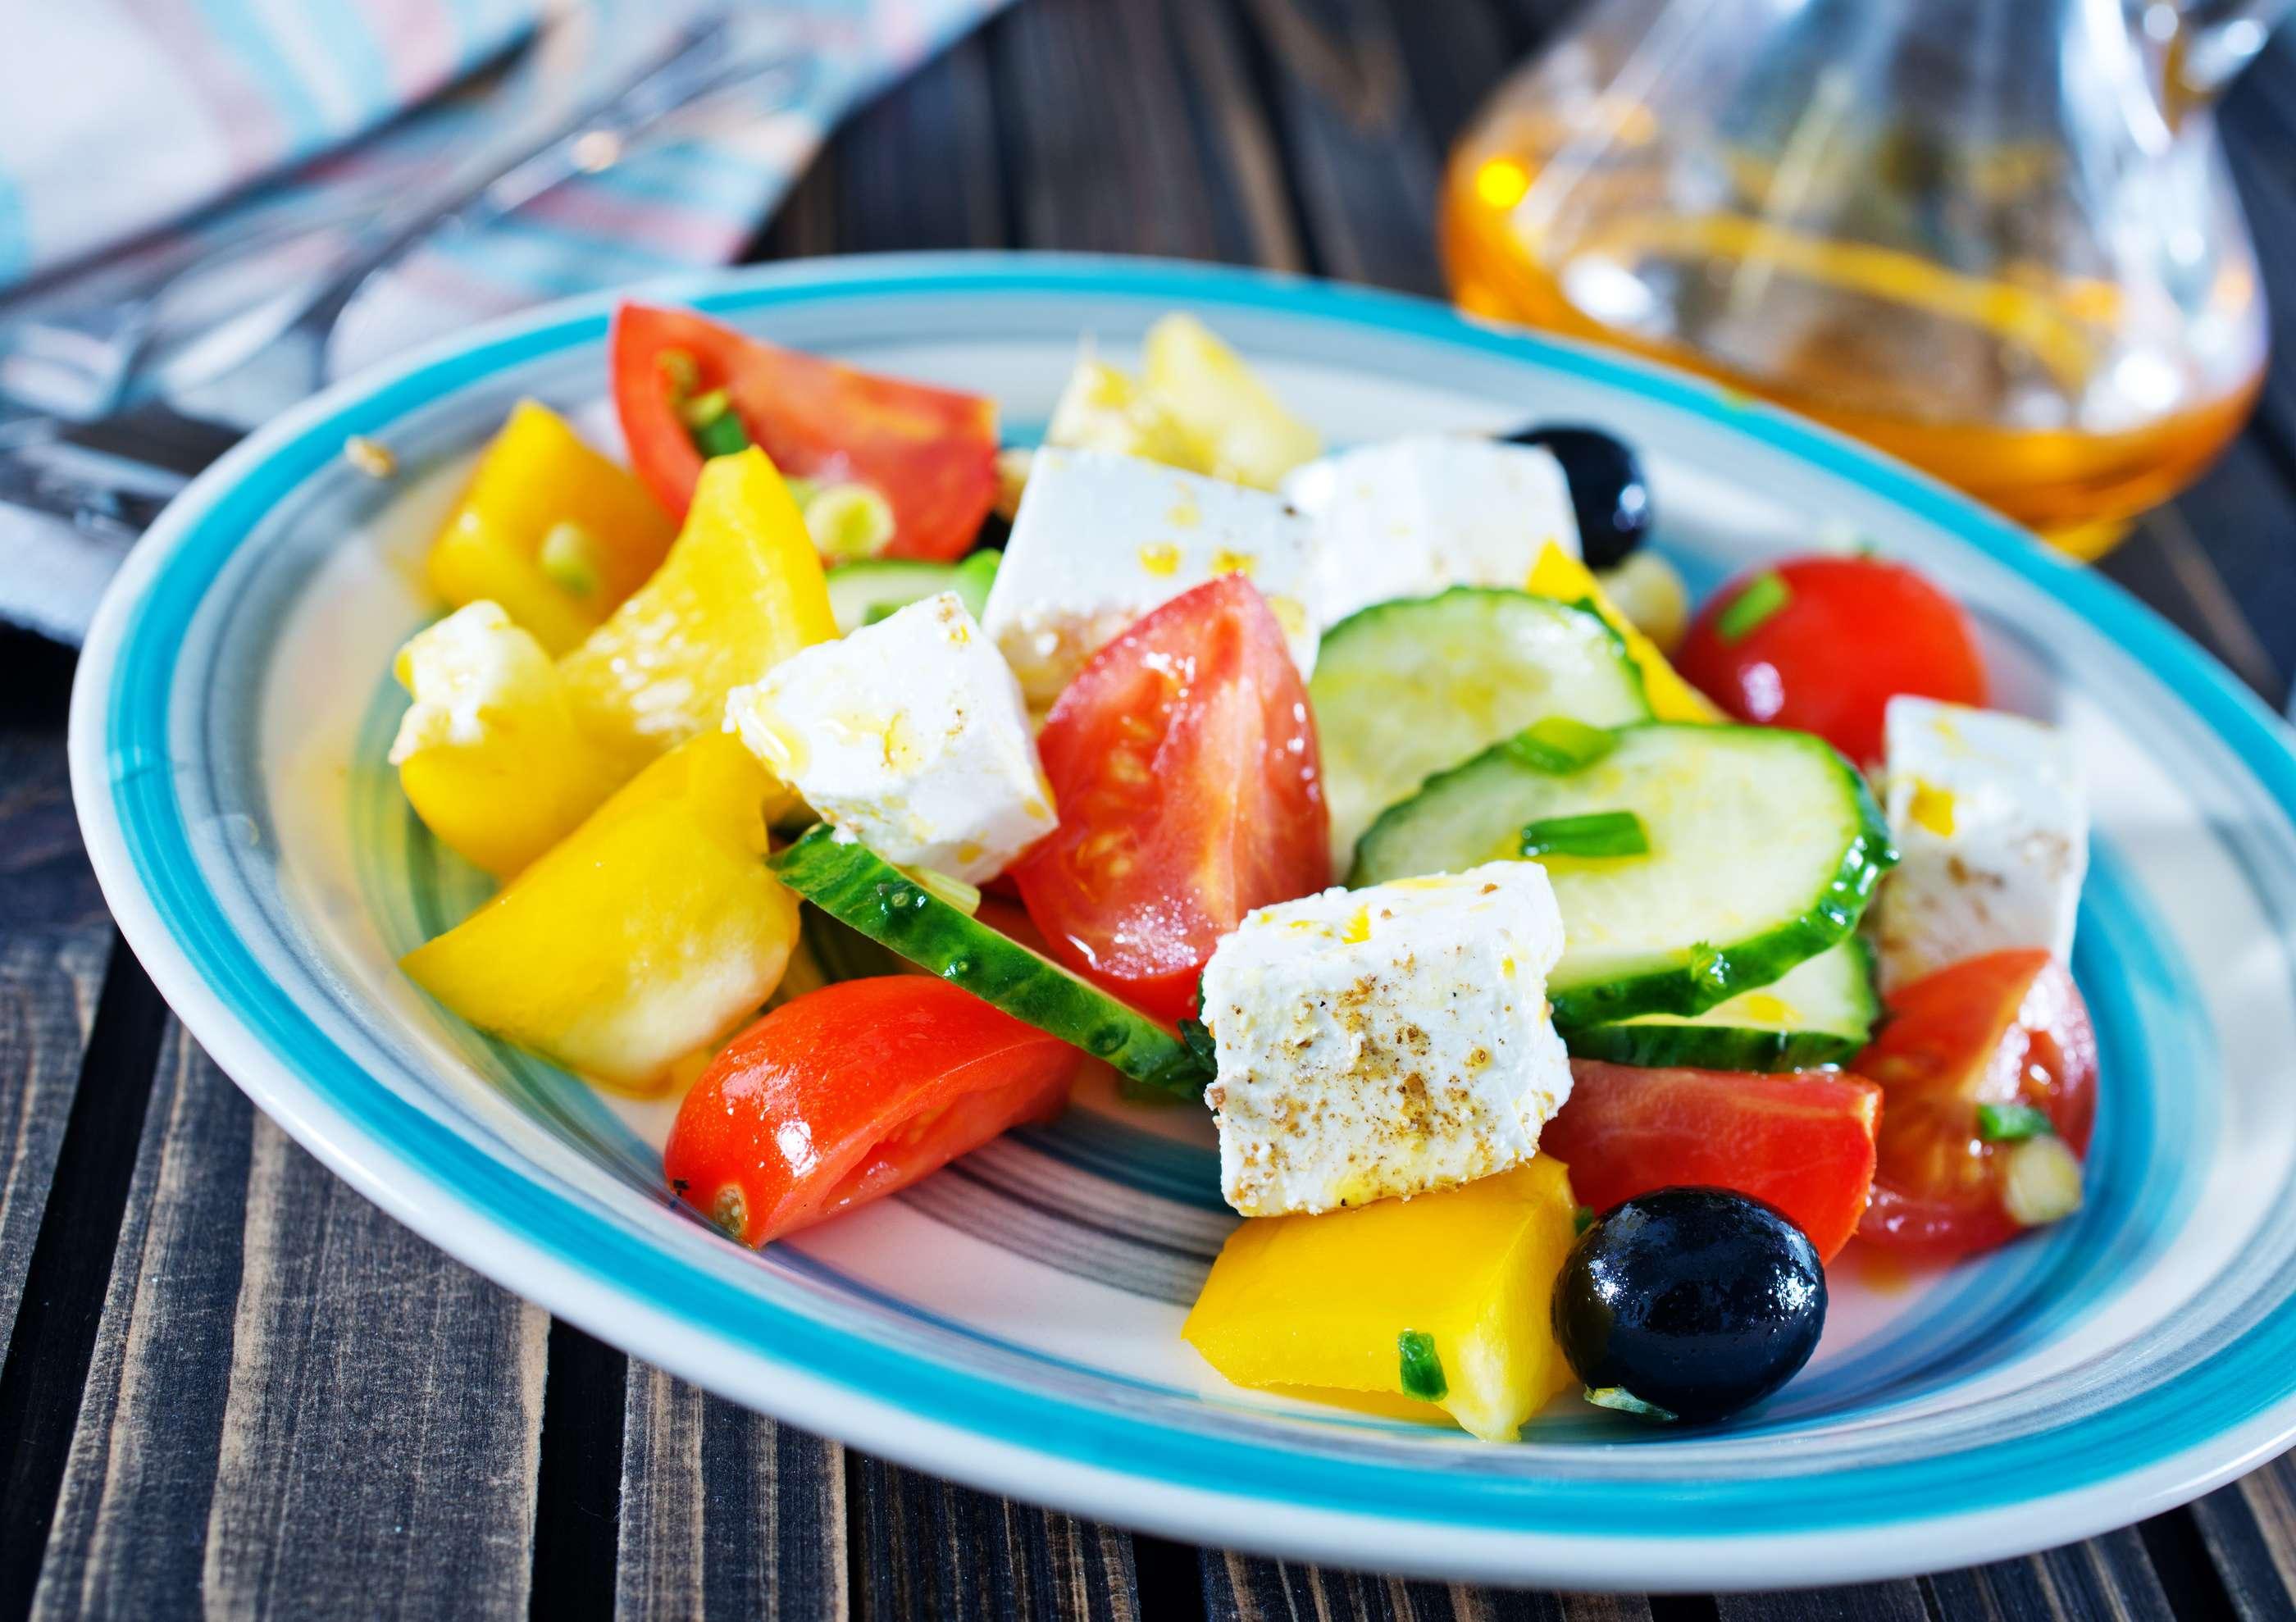 Schnellere Erholung mit cleverer Ernährung